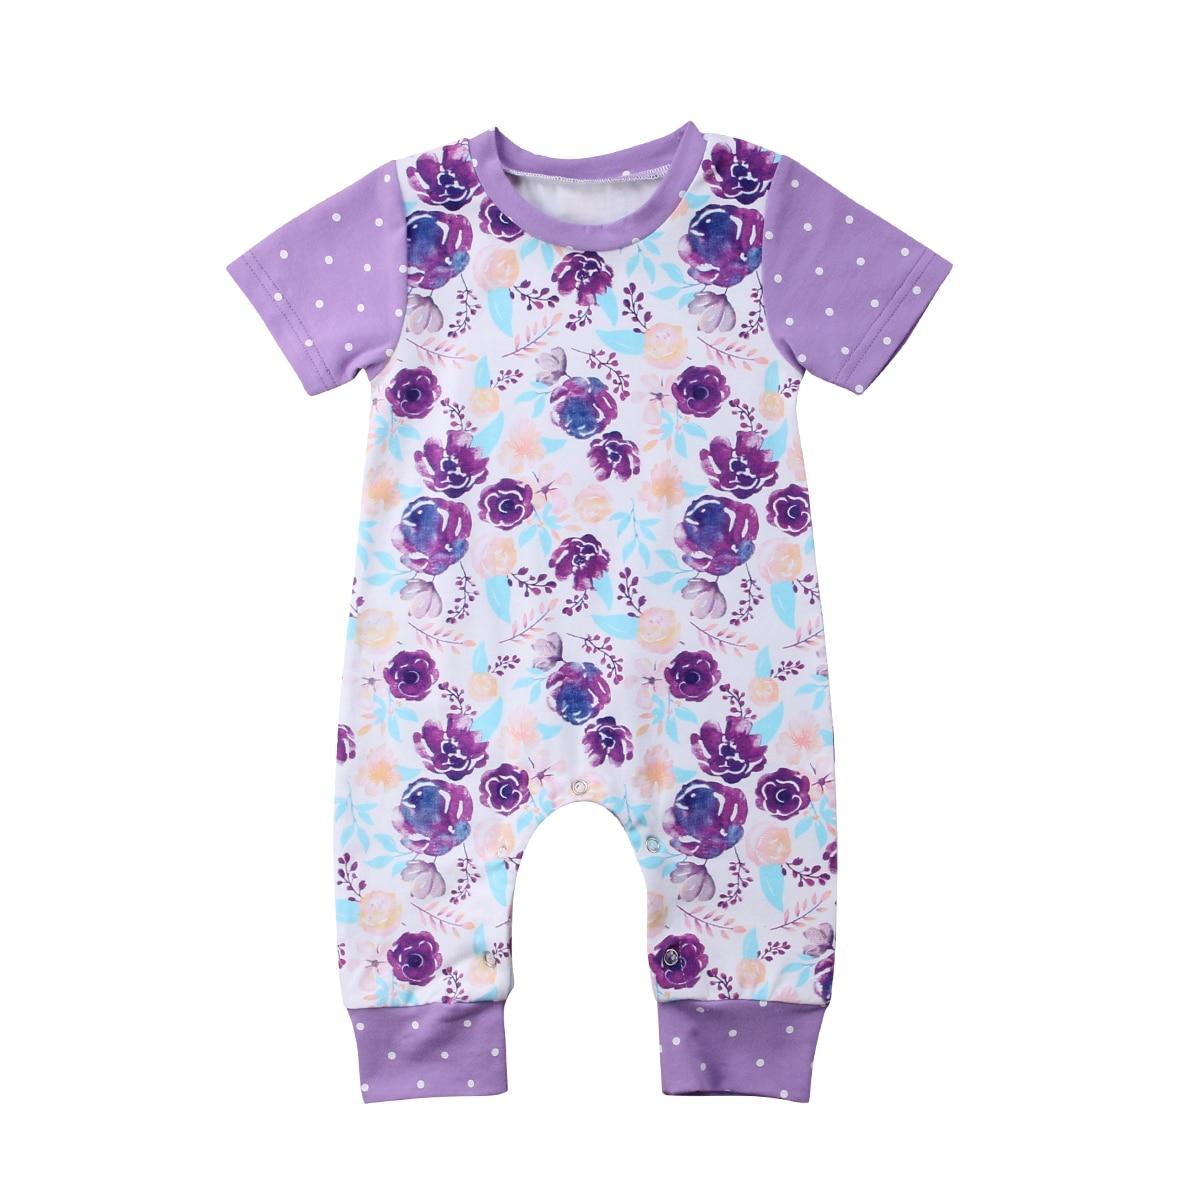 Girl Romper Newborn Infant Baby Boy Girl Short Sleeve Jumpsuit Floral Cotton Romper Outfit Sunsuit 0-24M